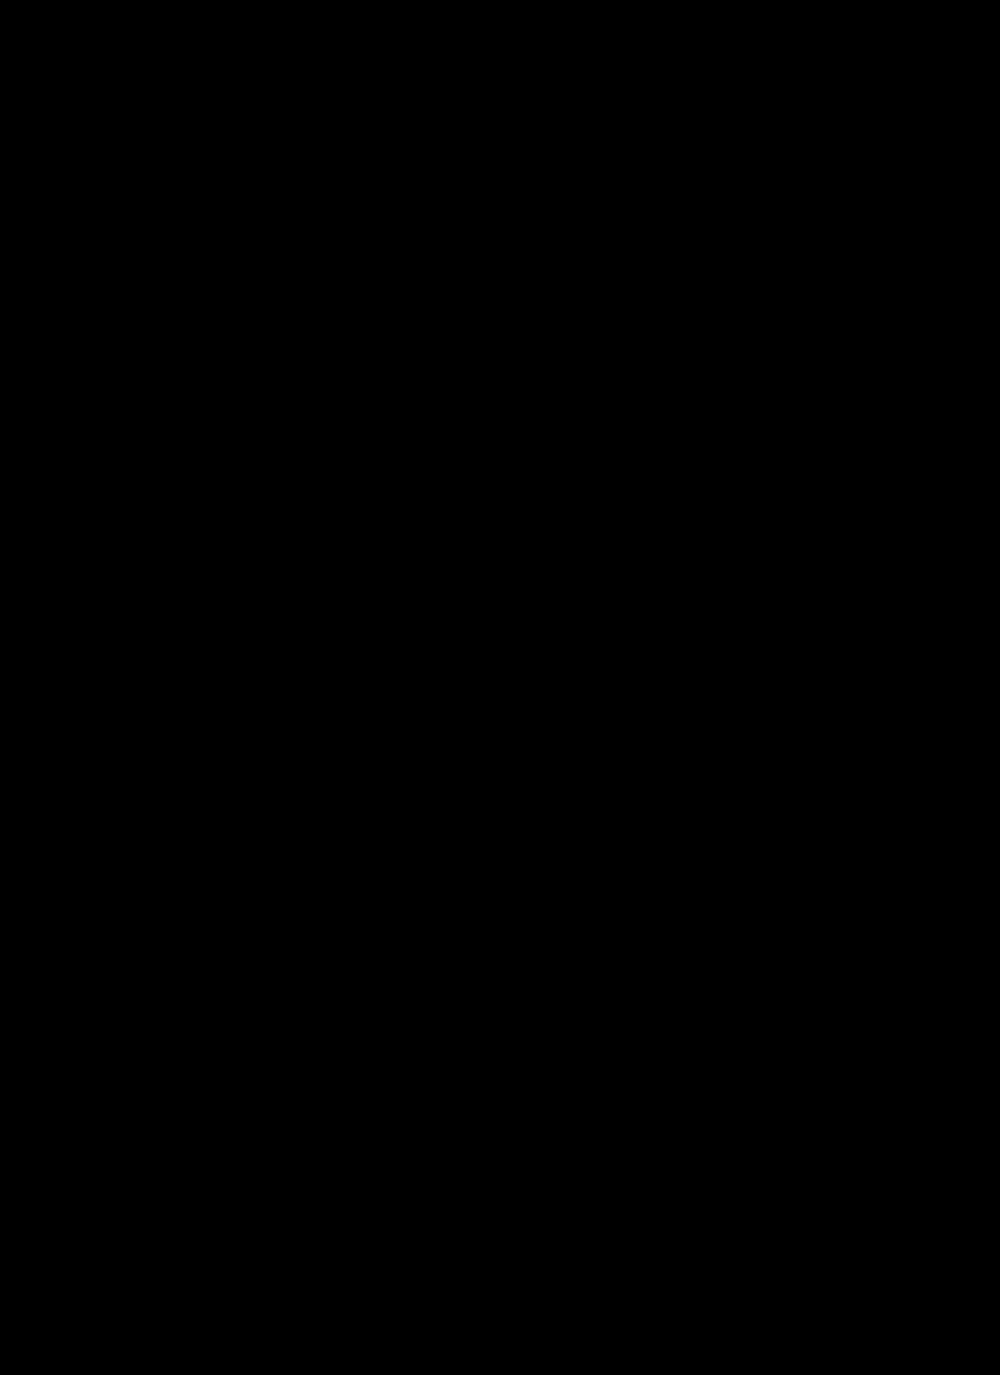 lic-006